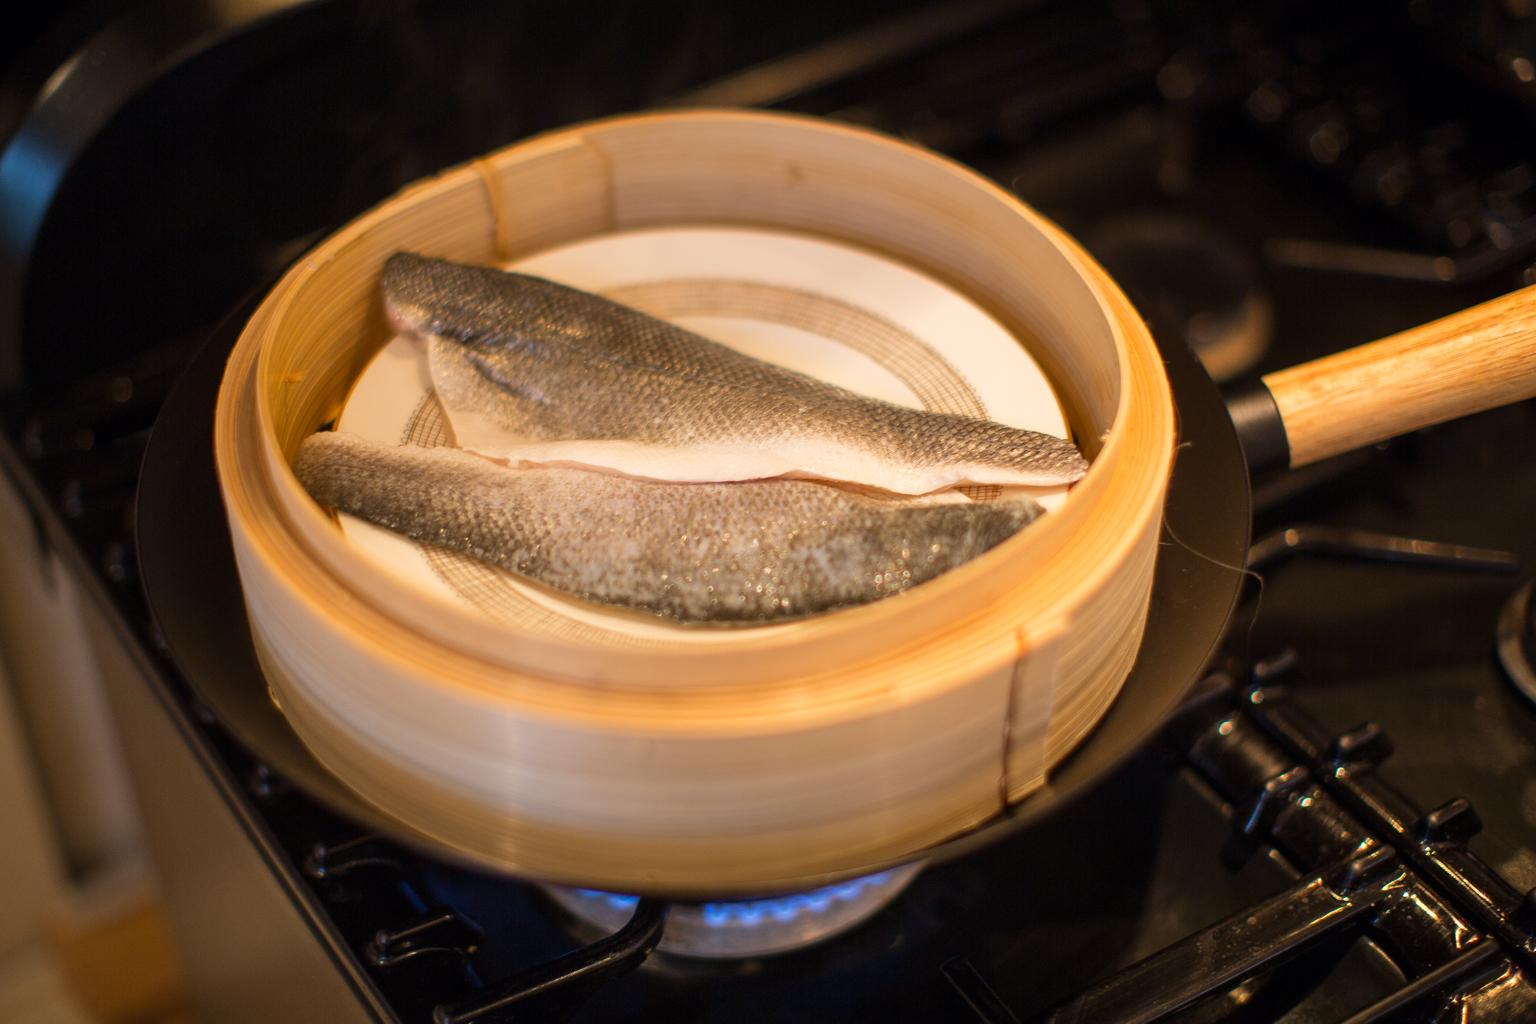 Fitness On Toast Faya Blog Girl Healthy Recipe Inspiratino Fish Steamed Seabass Ginger Carrot Wok Basket Bamboo Steam Diet Light-5